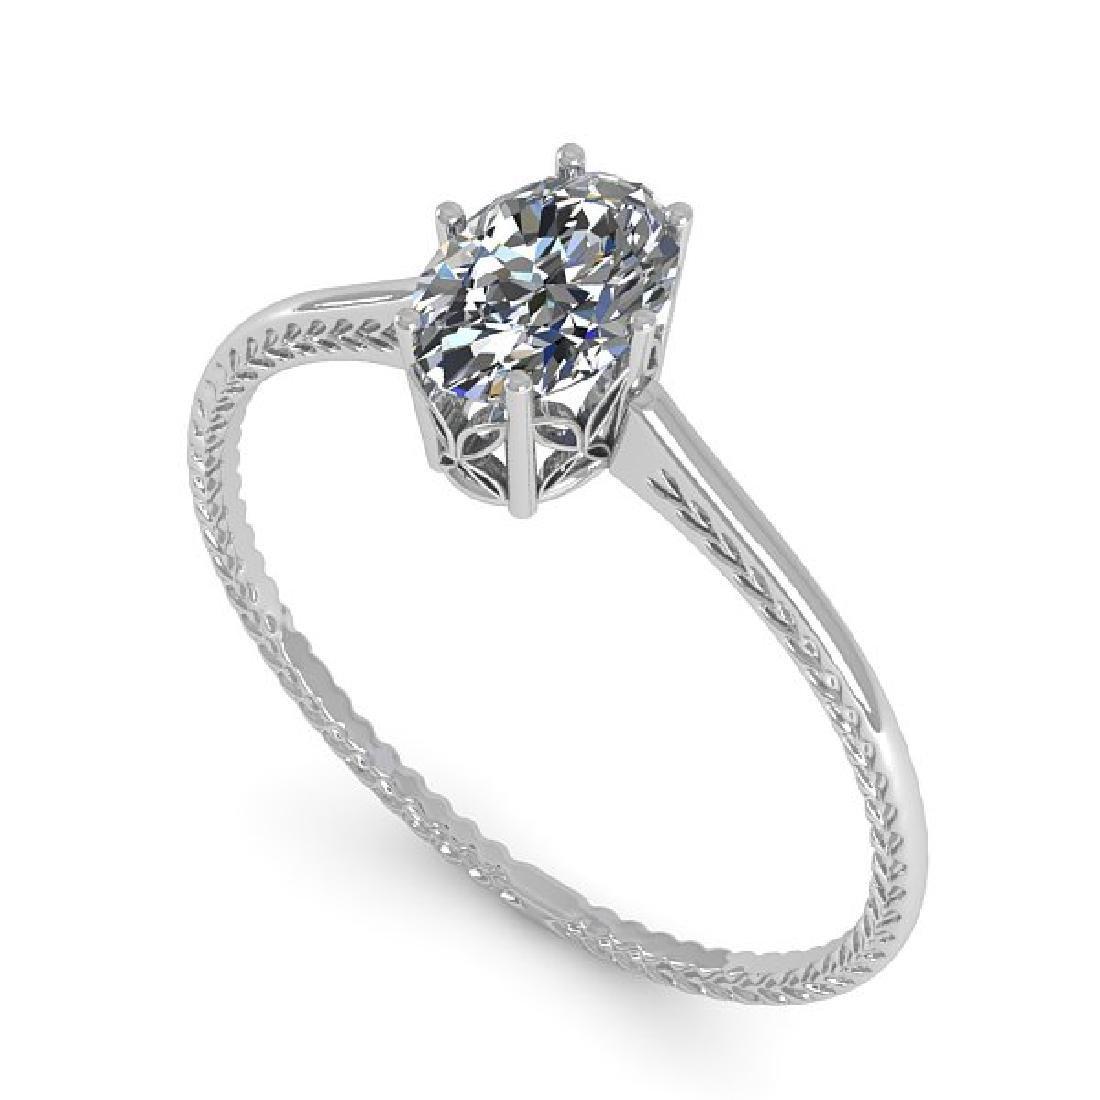 1.0 CTW VS/SI Oval Cut Diamond Art Deco Ring 14K White - 2